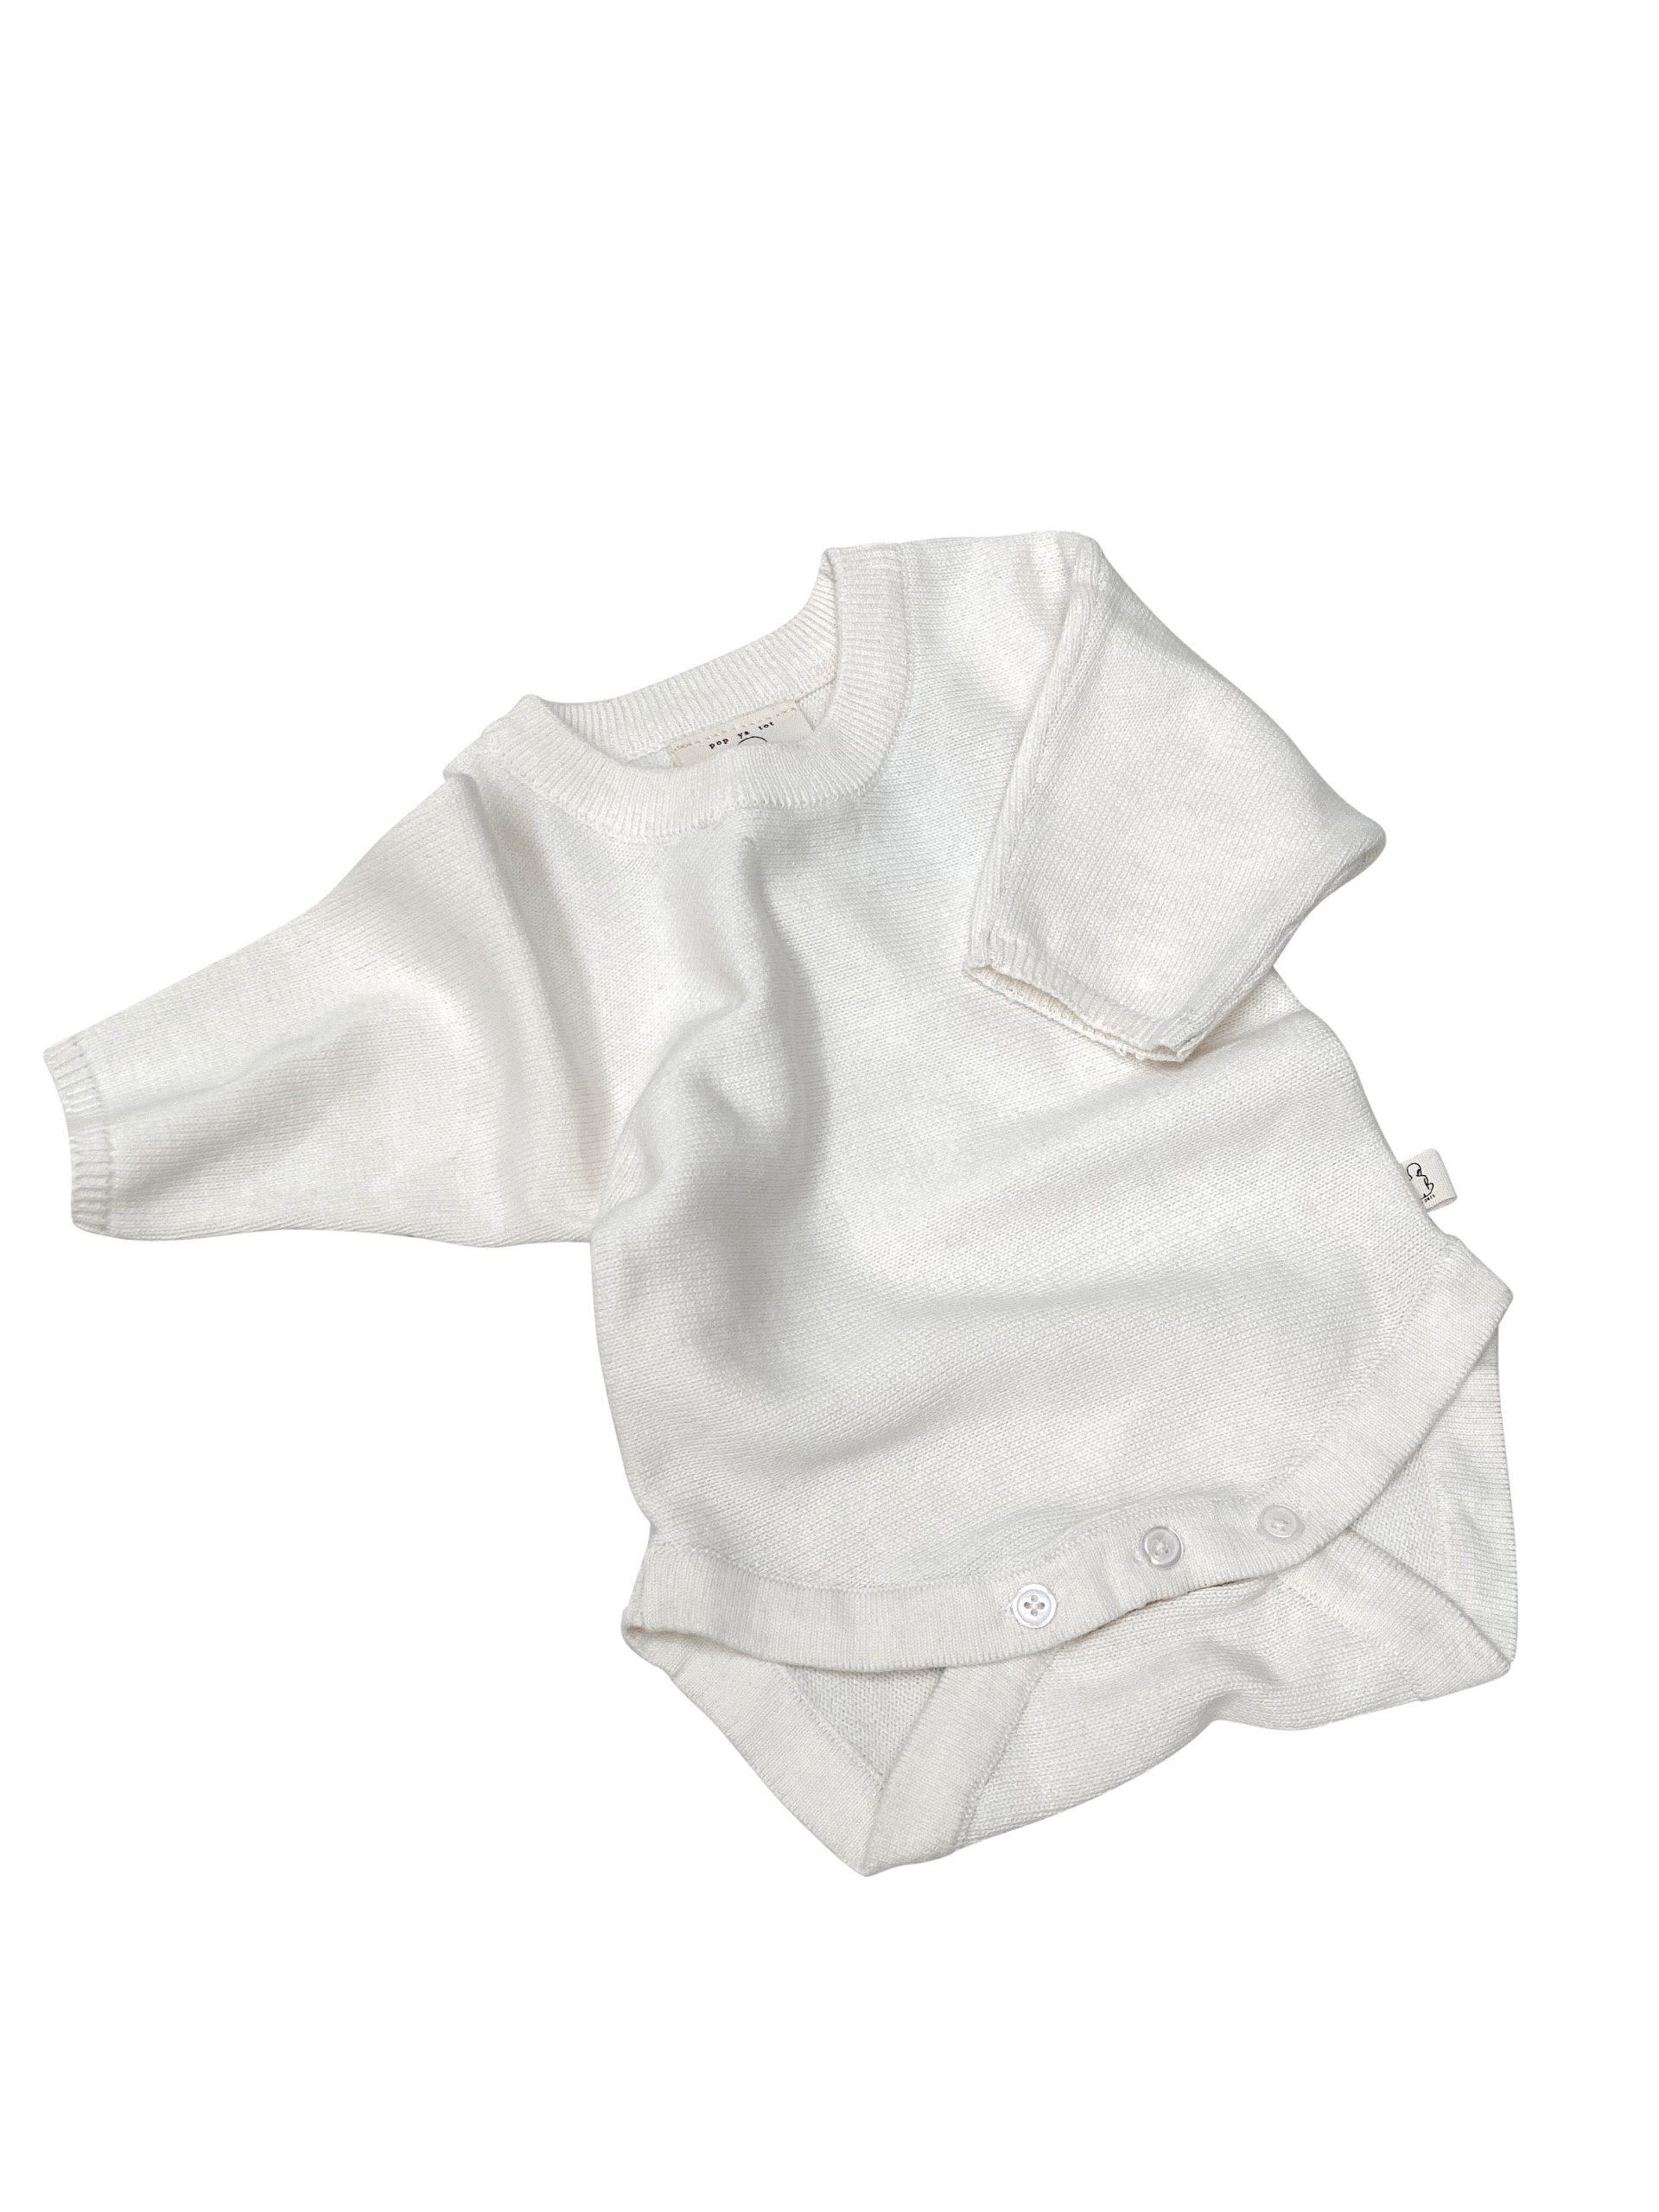 Pop Ya Tot Knitted Bodysuit (off white)